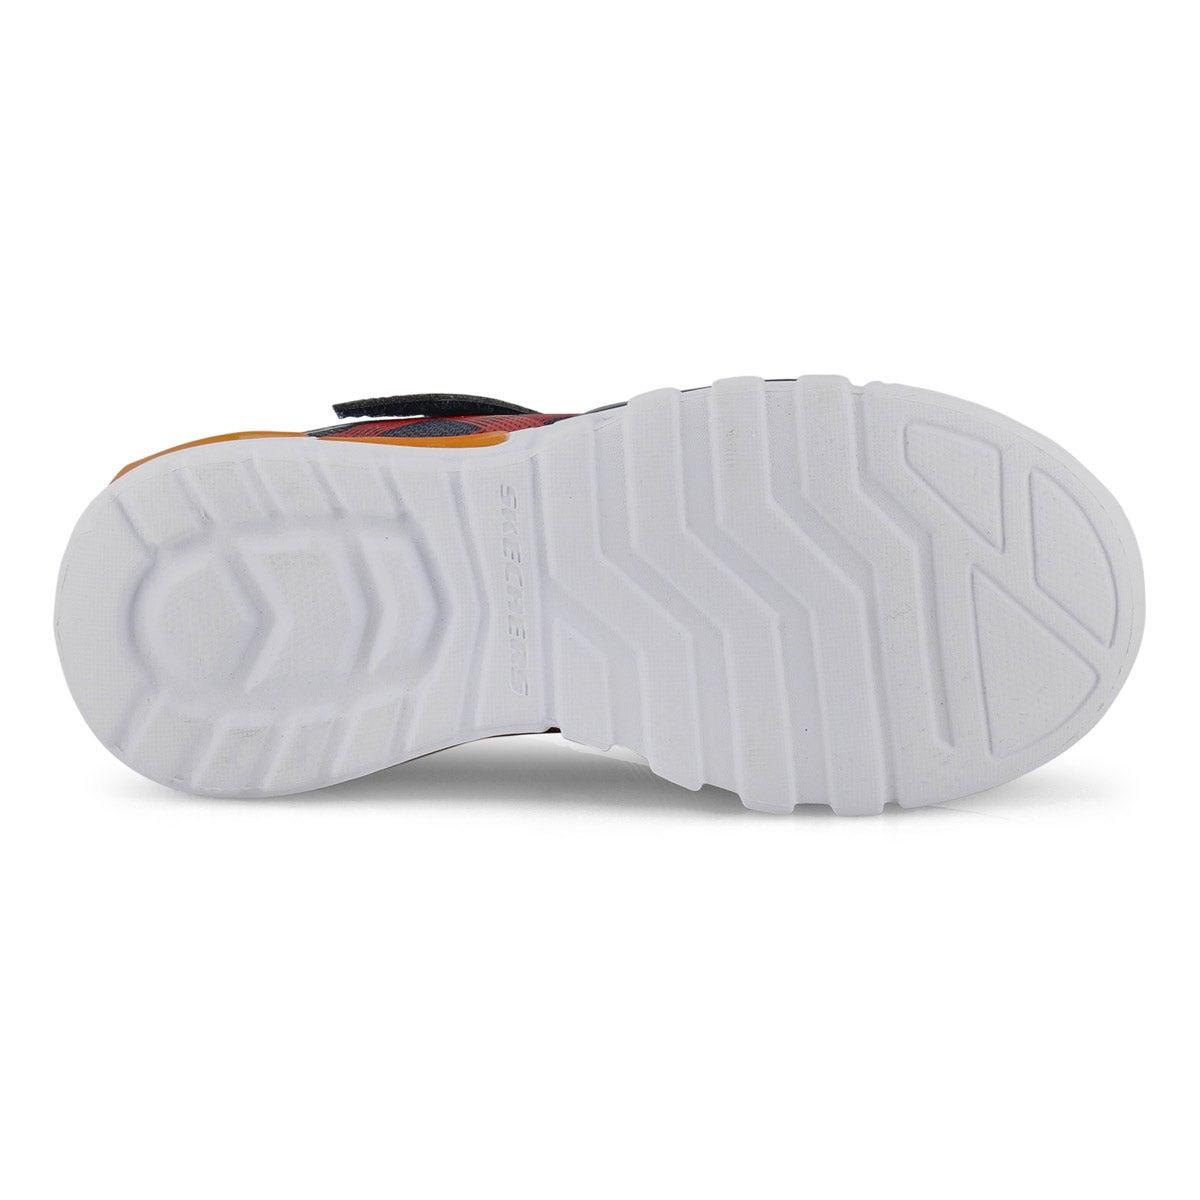 Bys Flex-glow nvy/rd light up sneaker